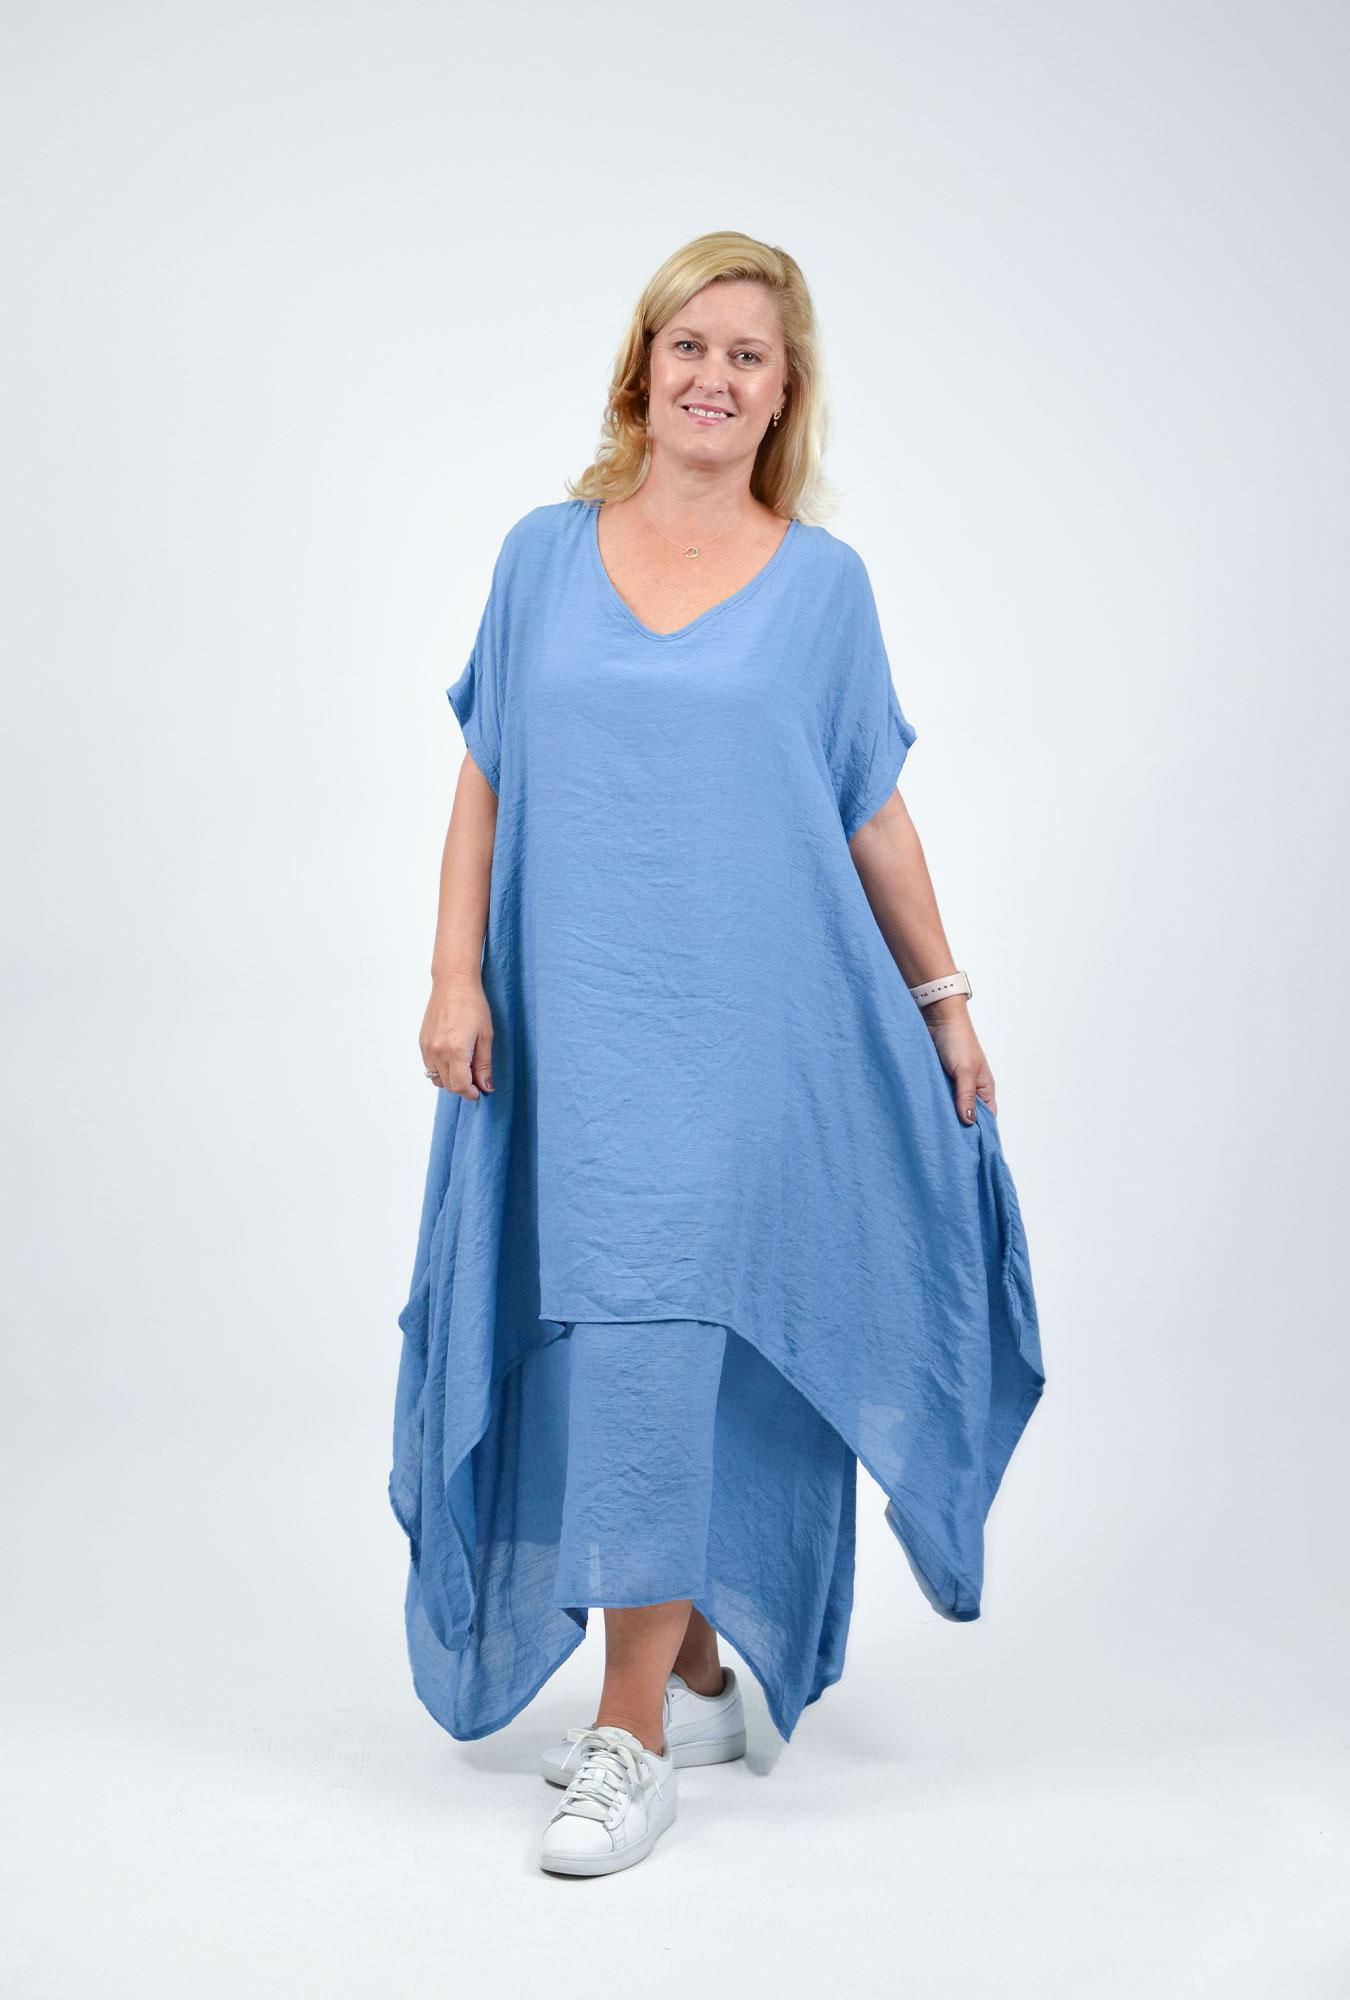 Cresley Dress in Blue